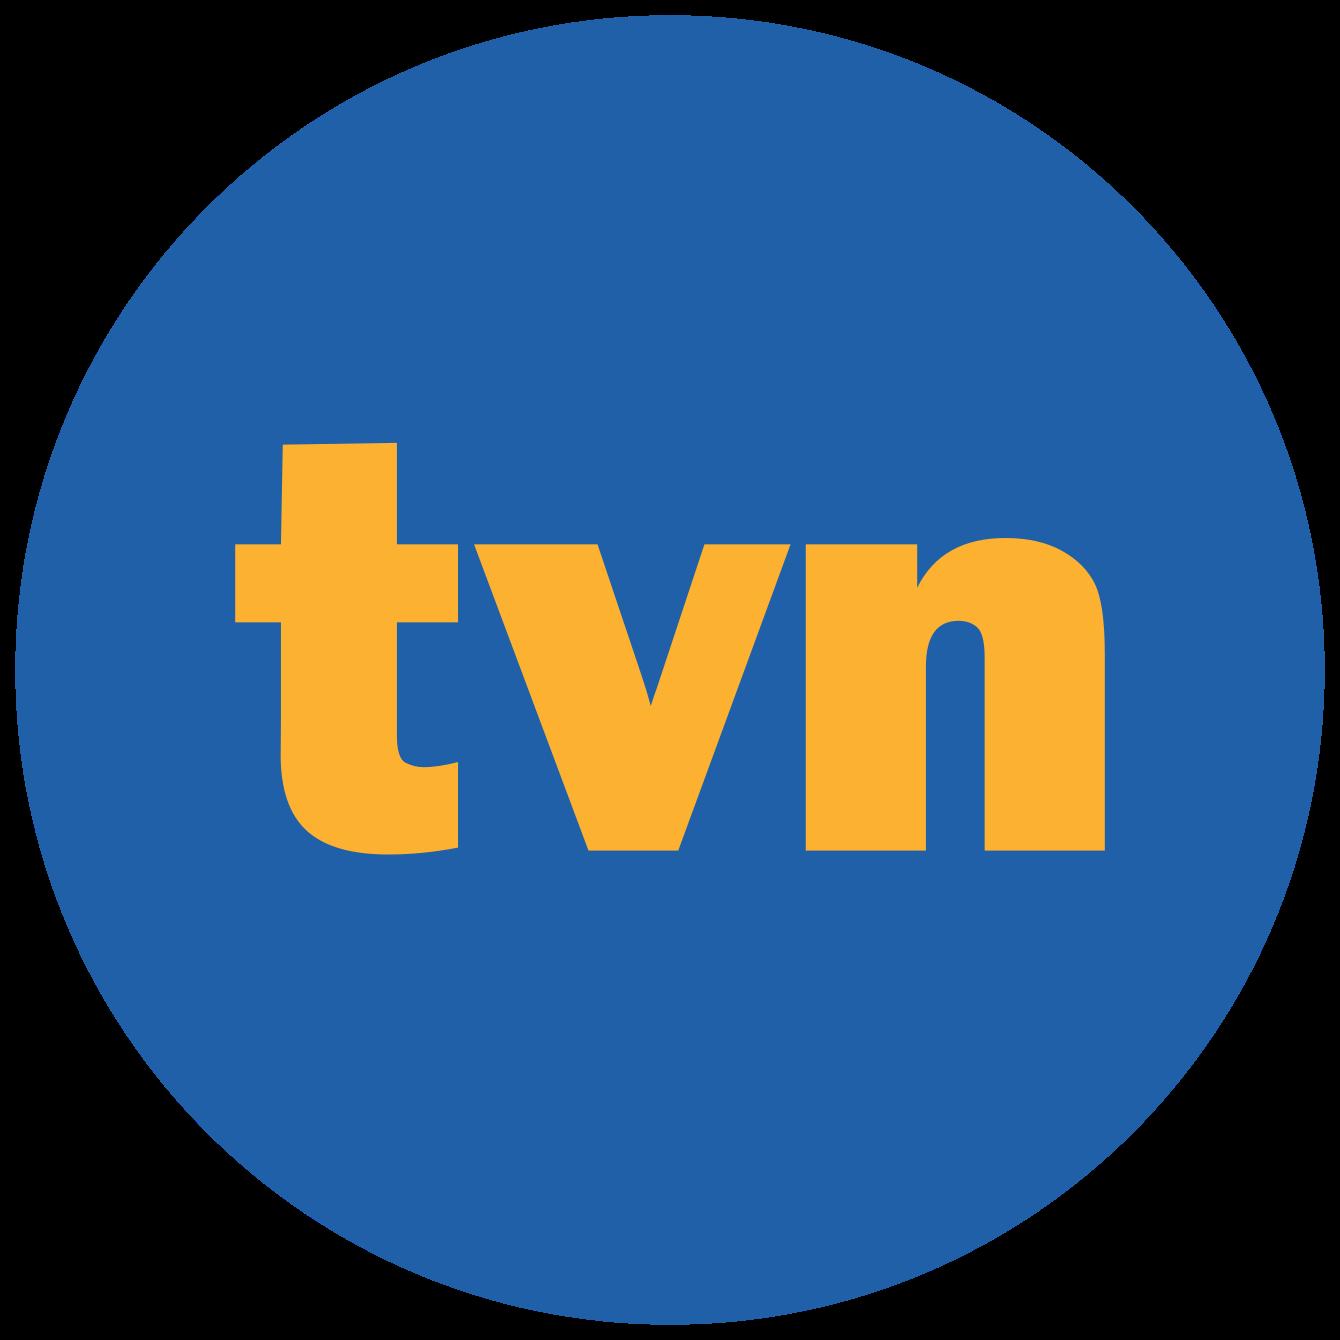 TVN infolinia | Numer, informacje dodatkowe, telefon, kontakt, adres